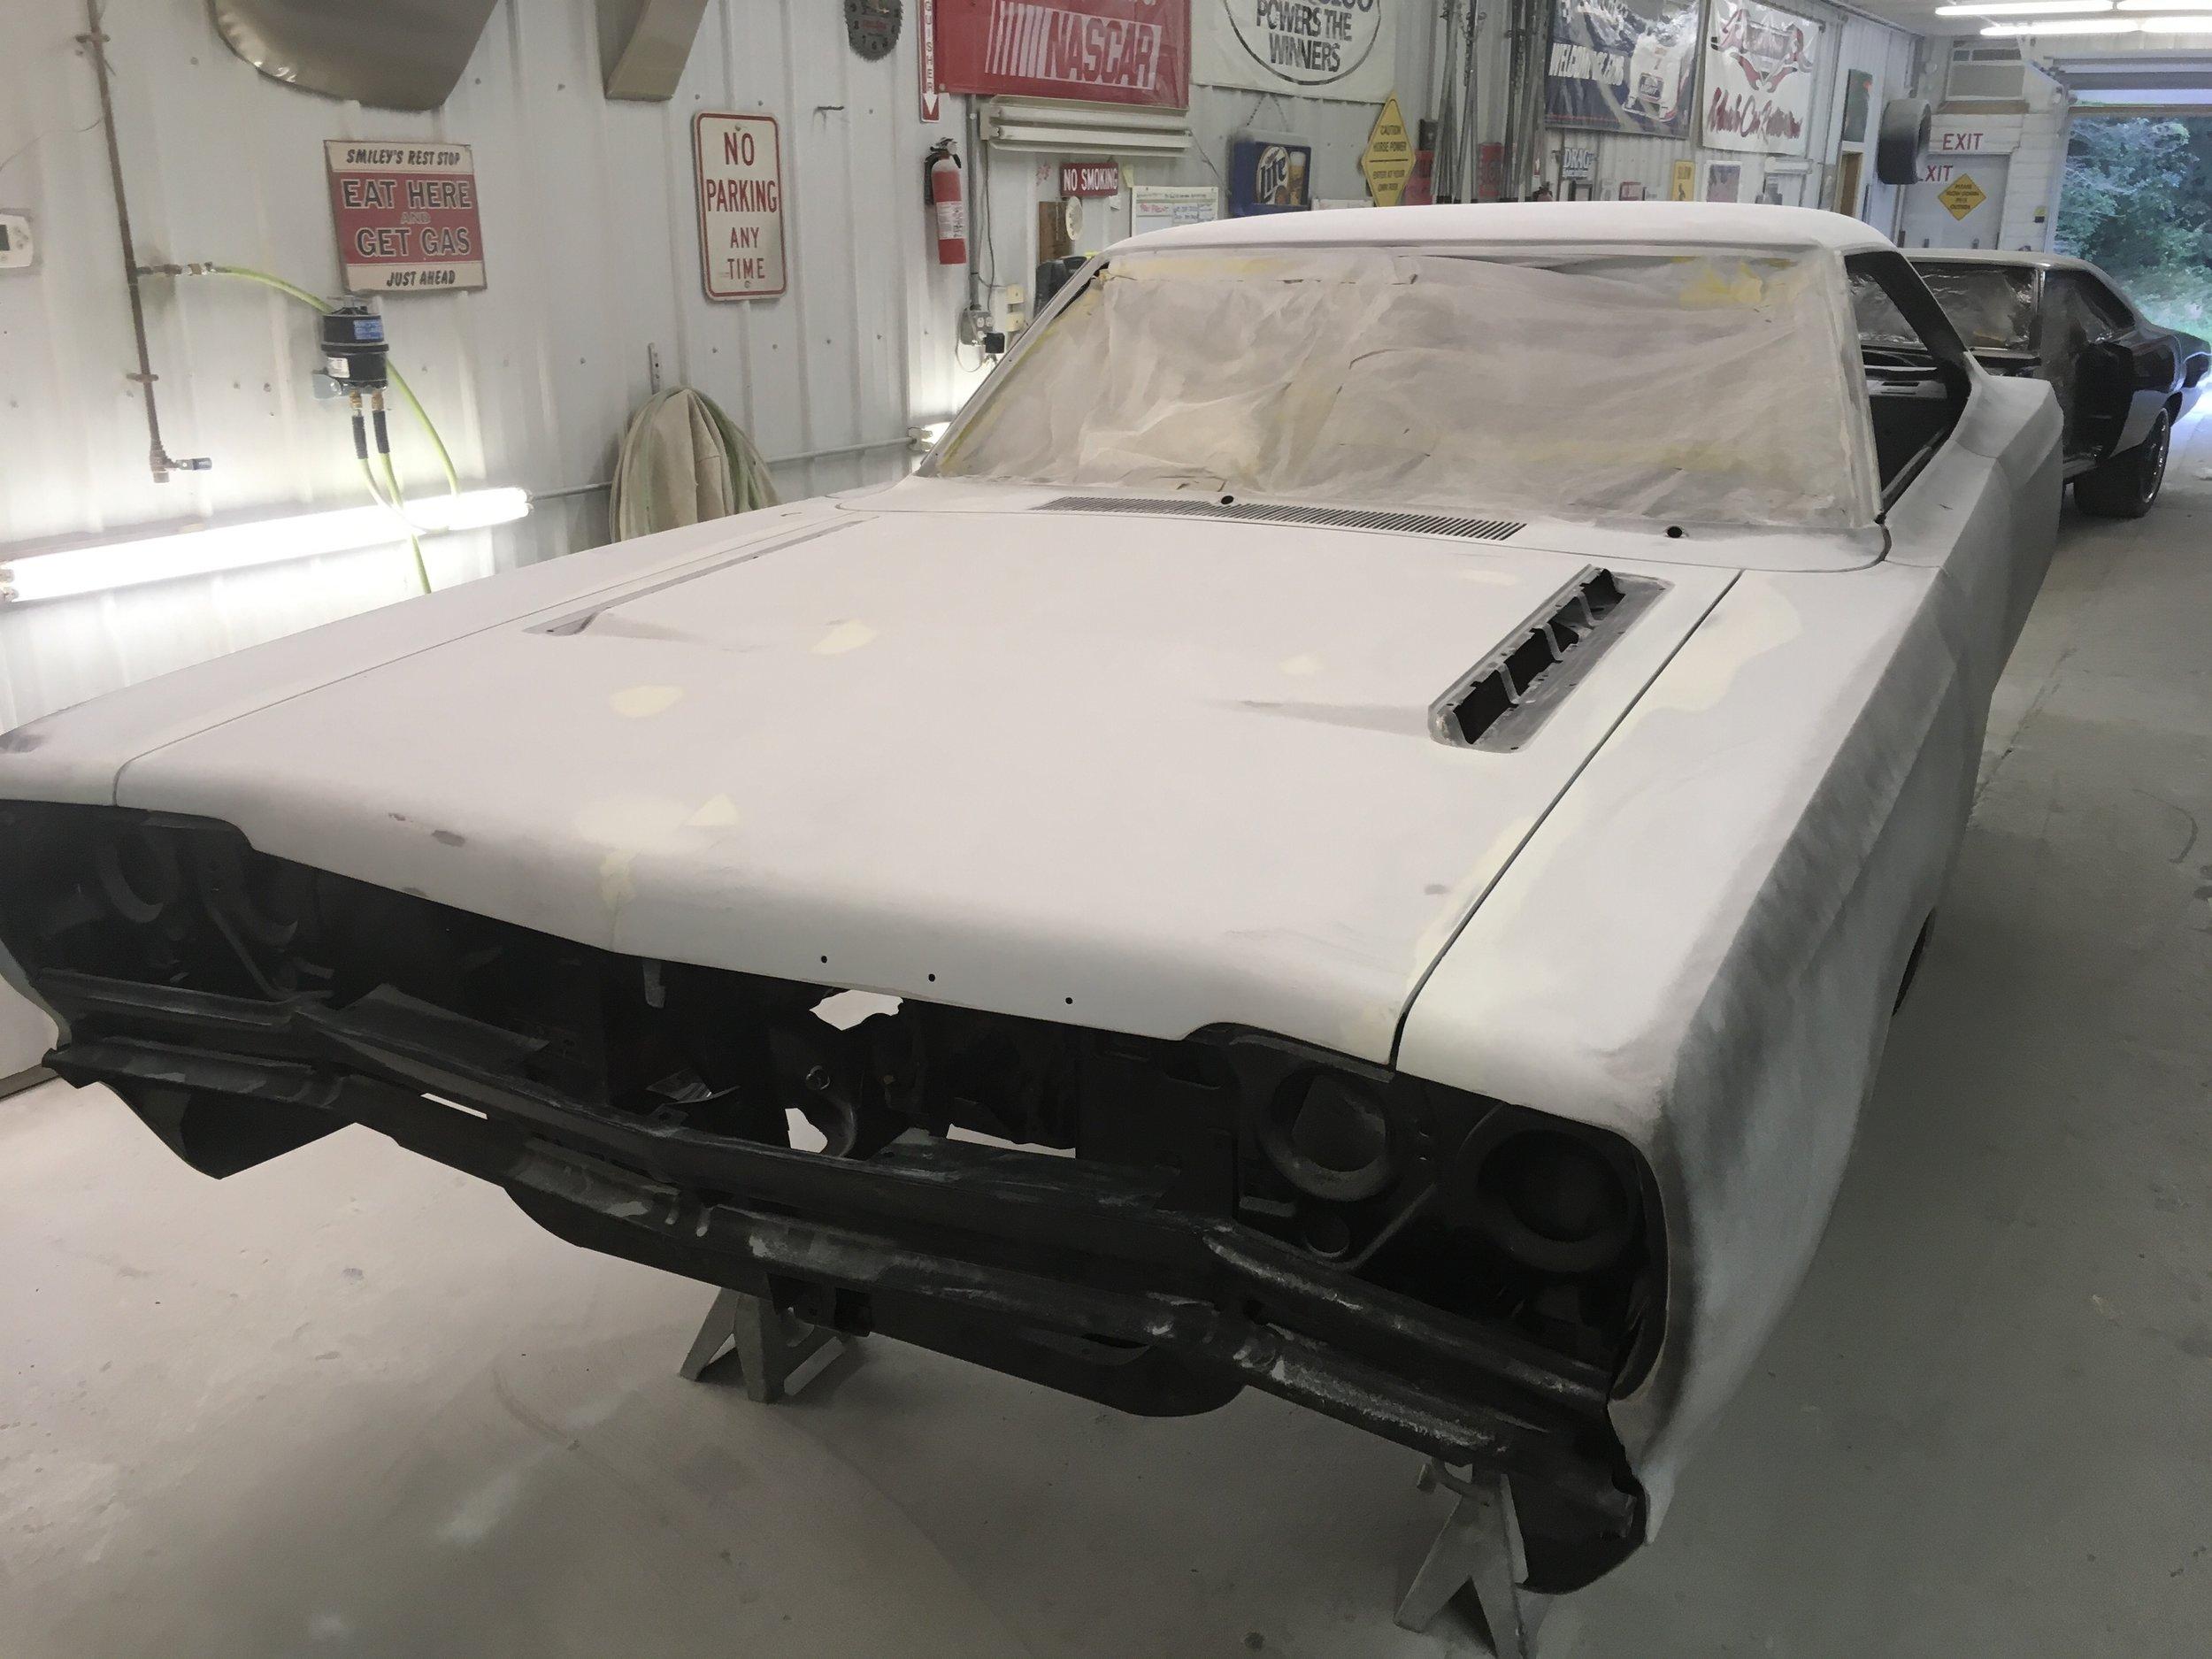 1968-Plymouth-GTX-minneapolis-custom-built-hot-rod-restoration-painting-and-bodywork.jpg